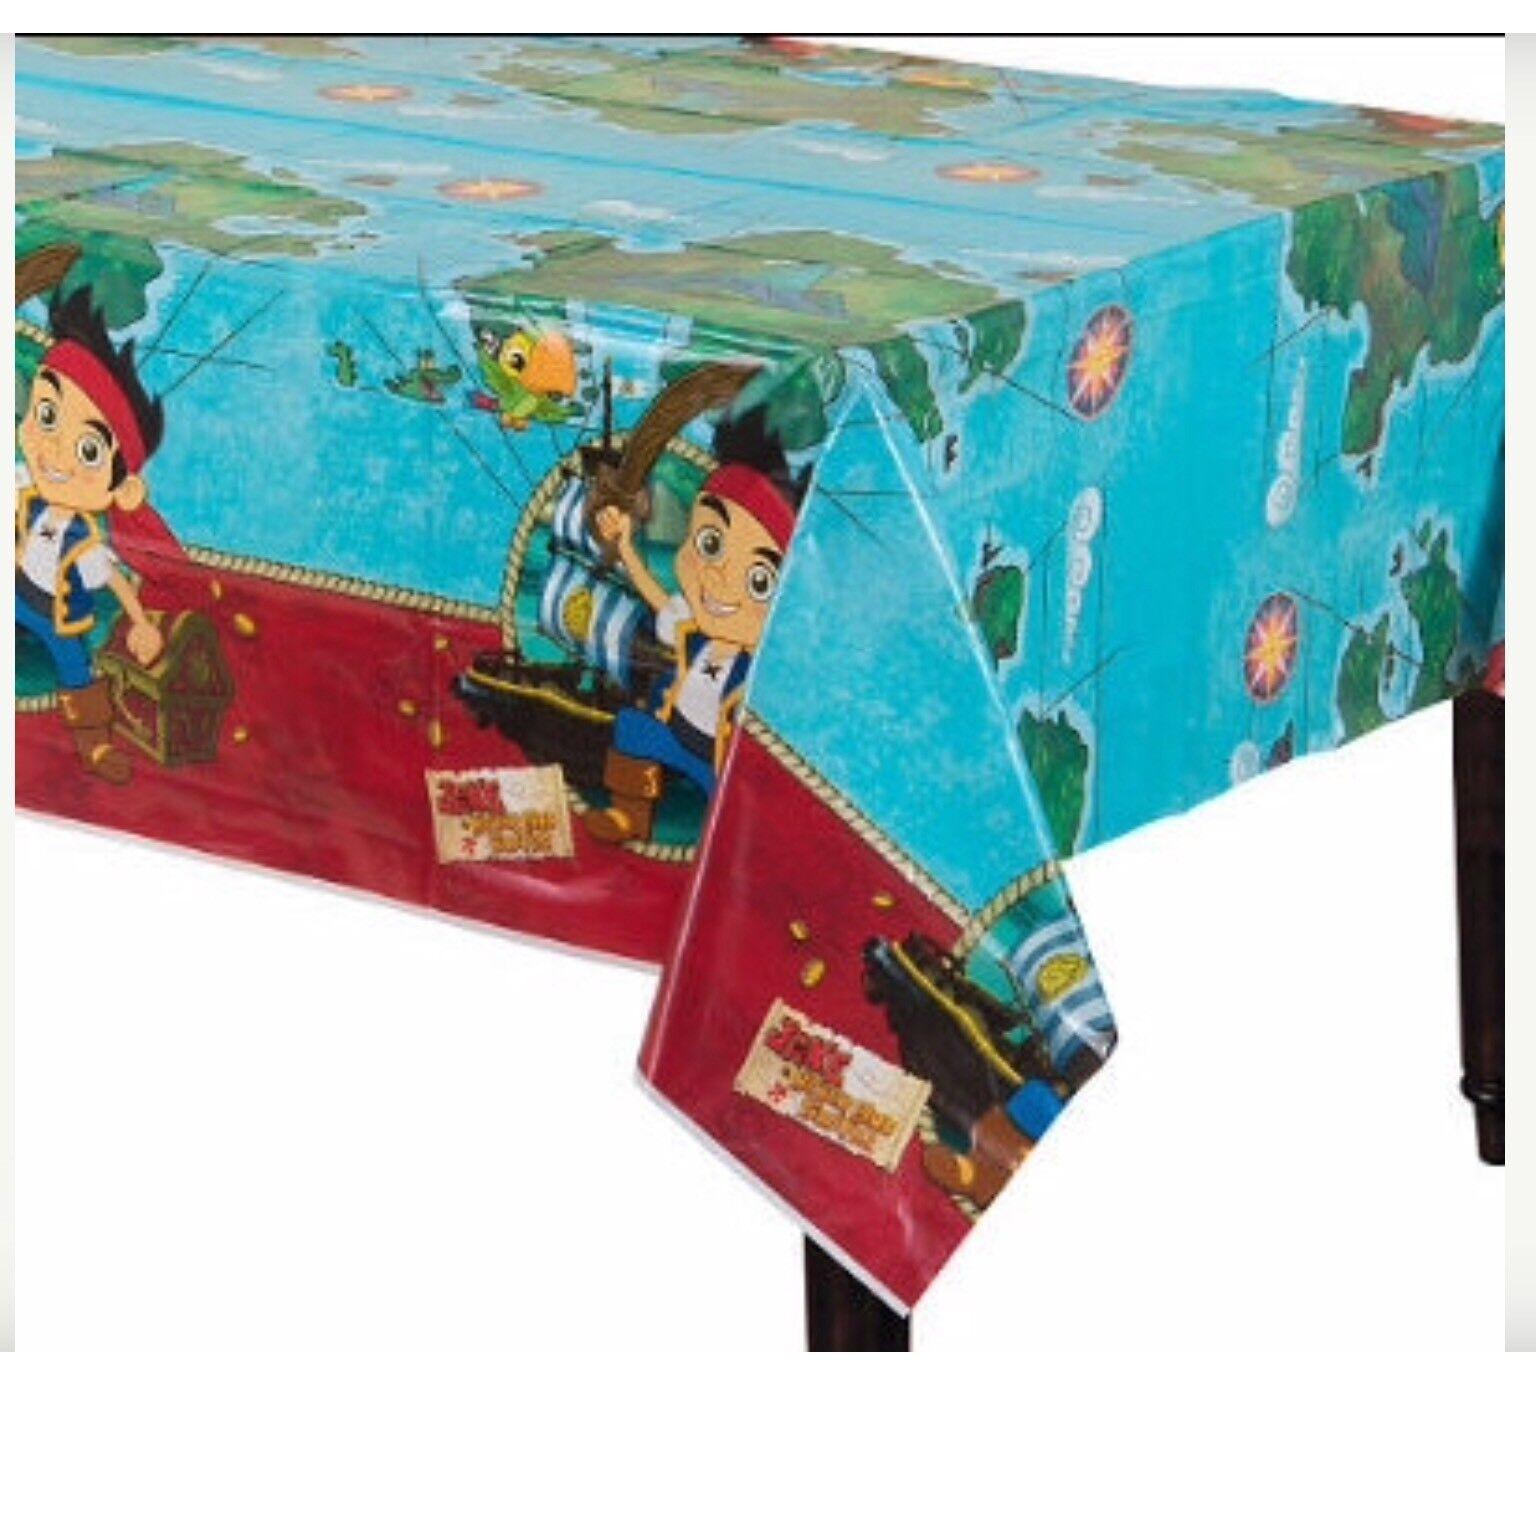 Hallmark Disney Birthday Party Supplies Table cover Tableclo